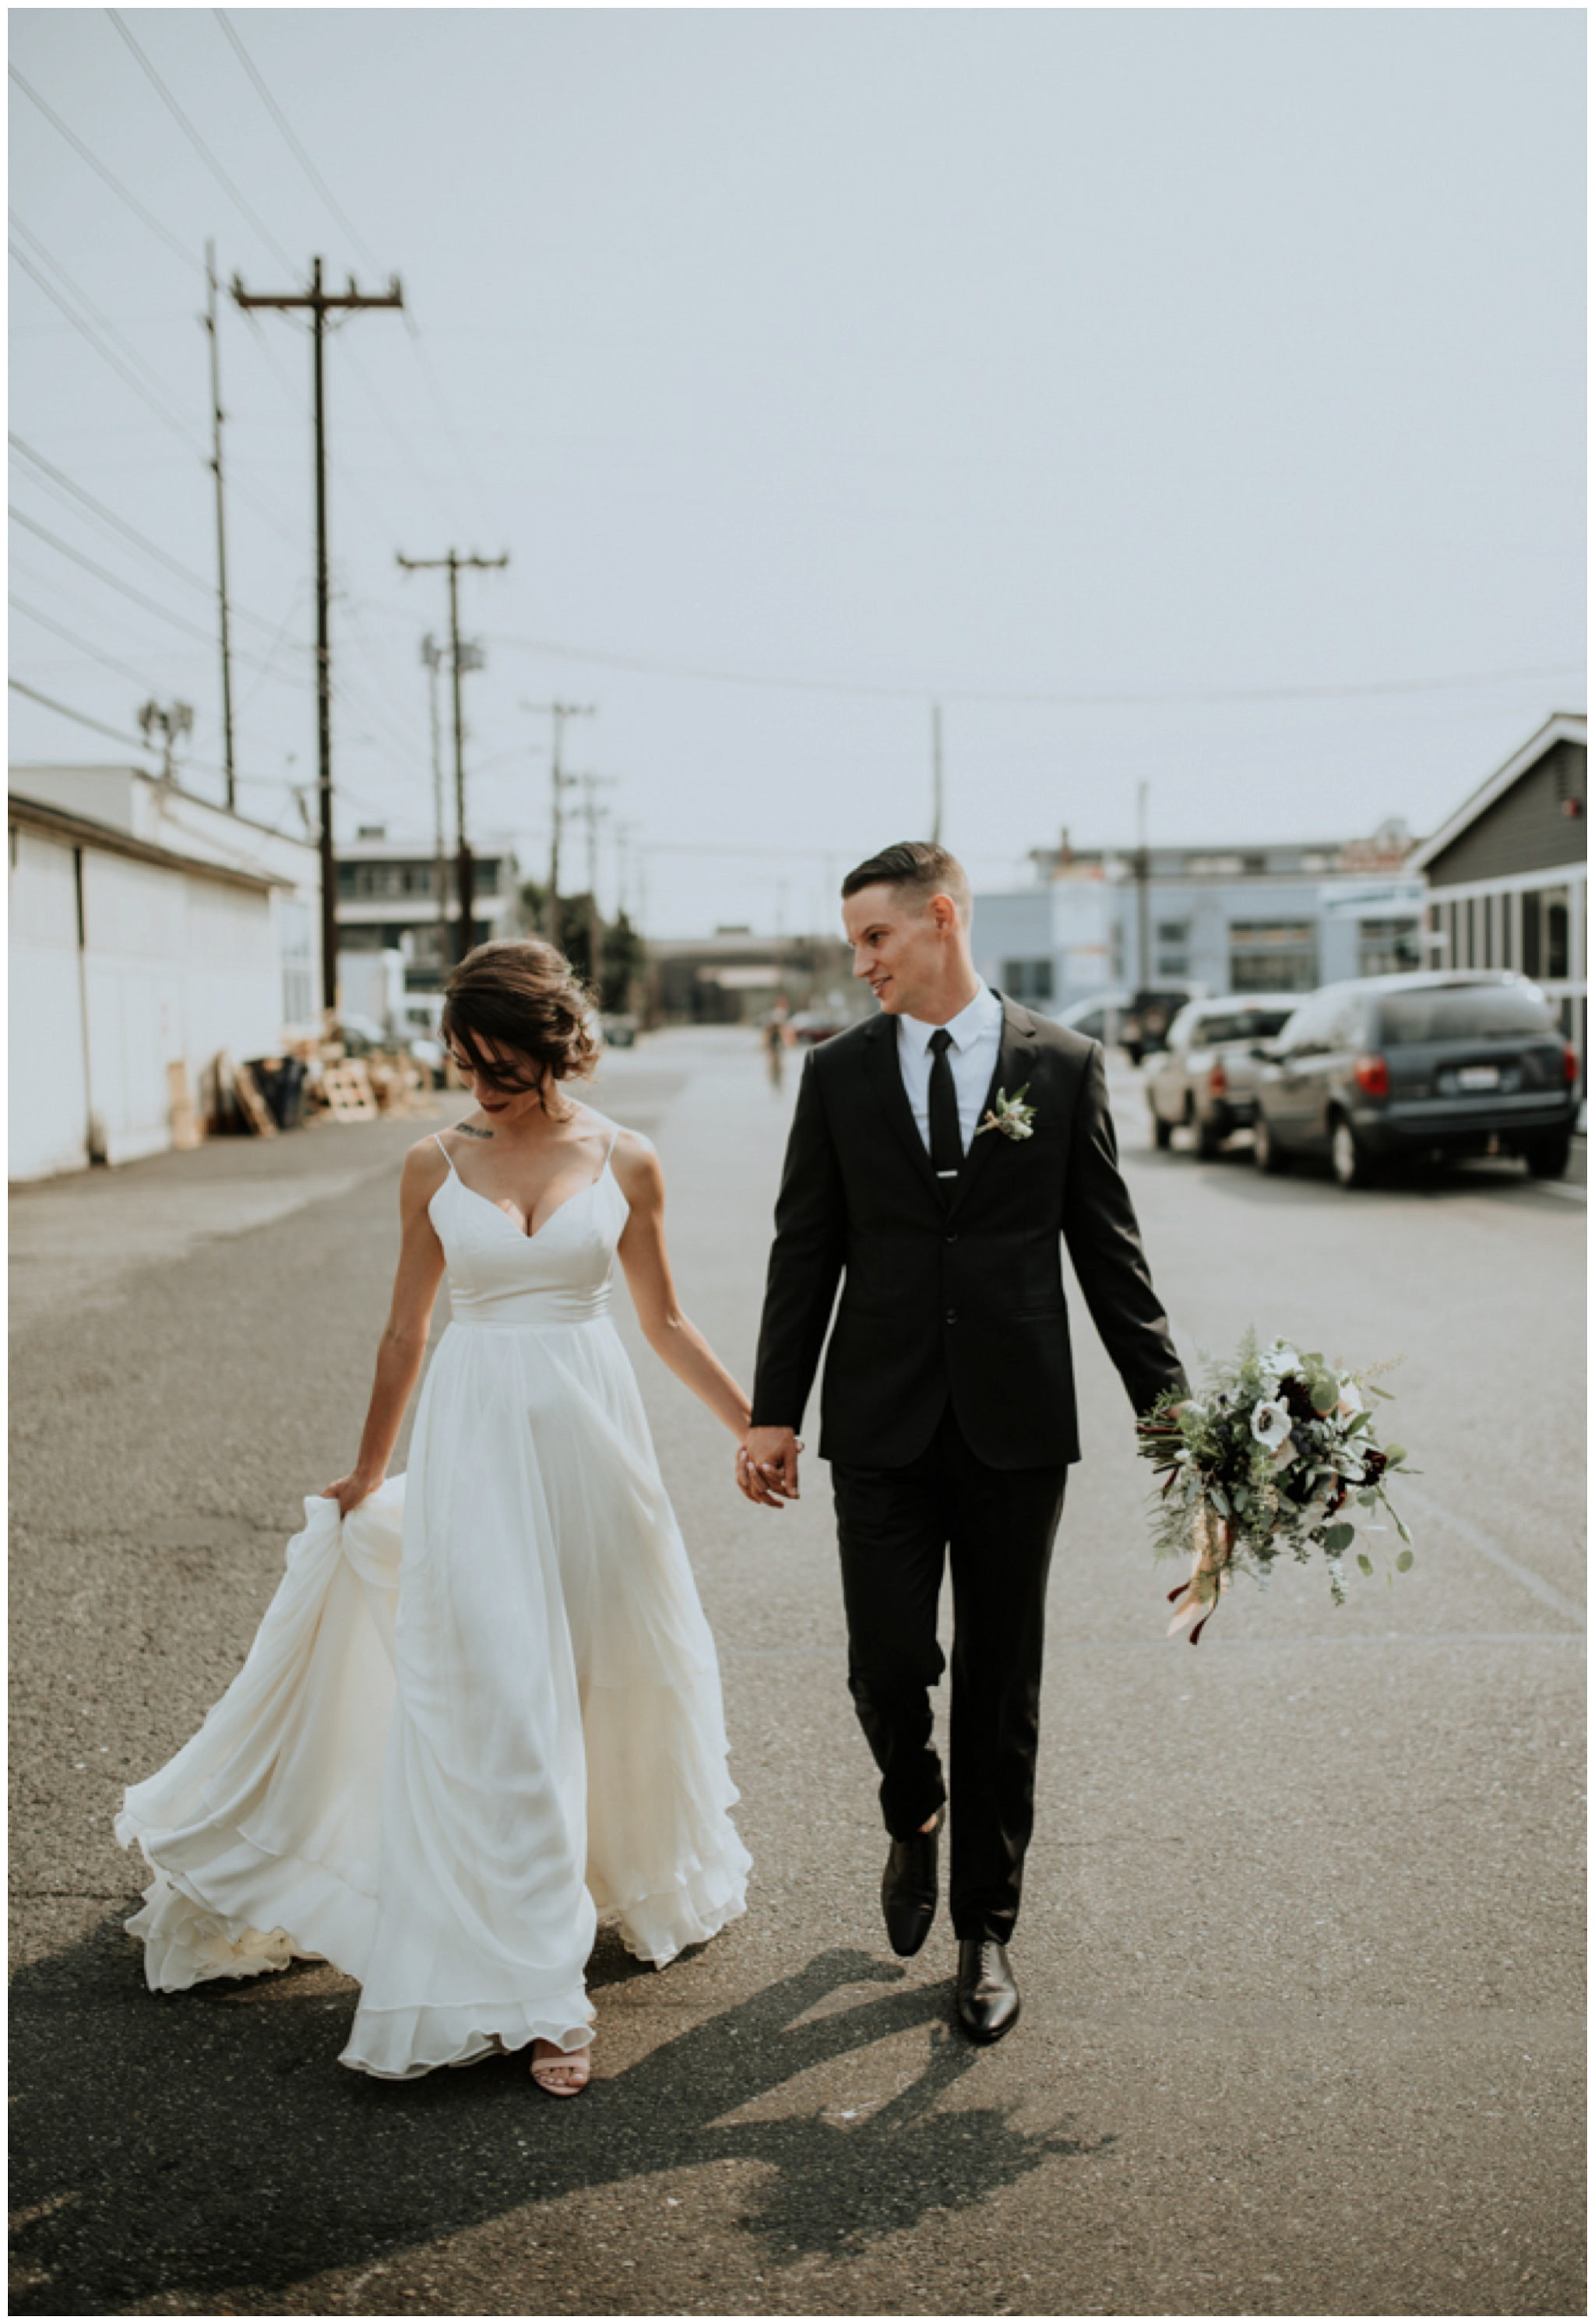 alyssa-keiran-westland-distillery-urban-seattle-wedding-photographer-caitlyn-nikula-72.jpg